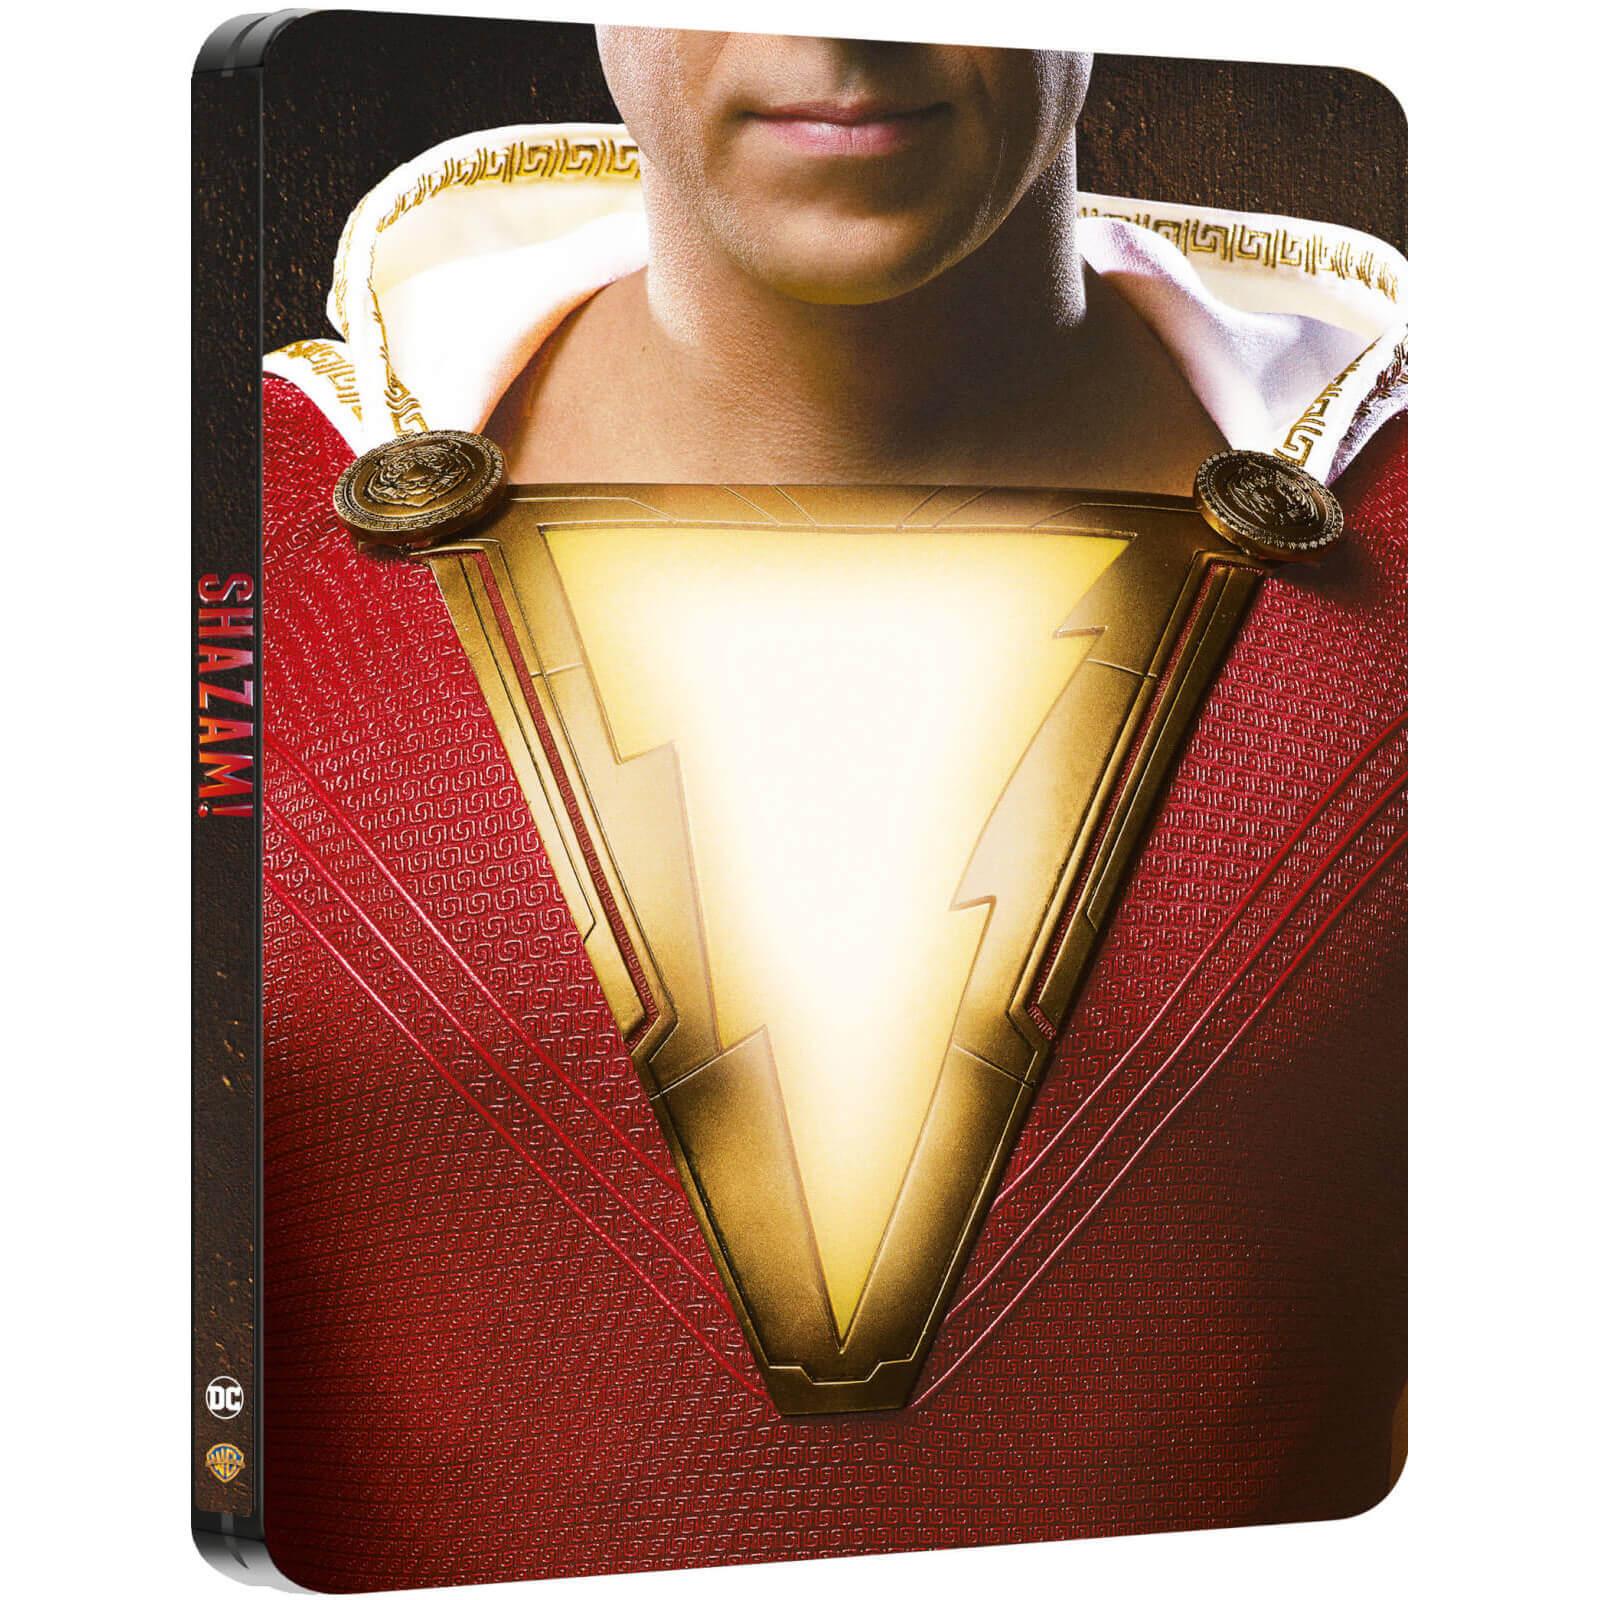 Shazam! - Steelbook Edition (4K Blu-ray + Blu-ray) für 15,99€ inkl. Versand (Zavvi UK)